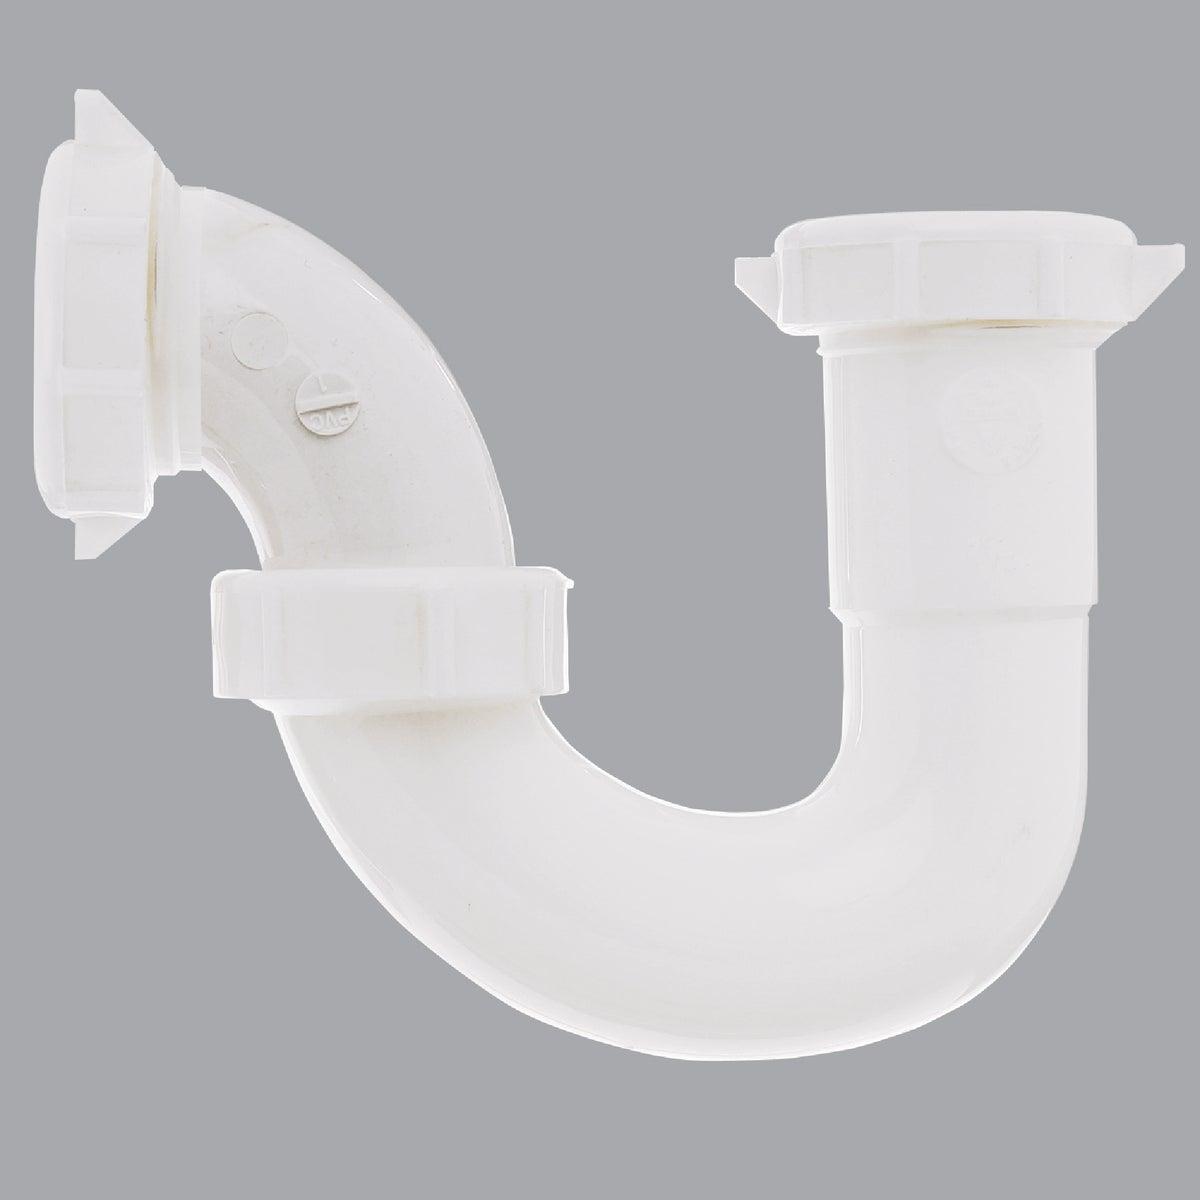 Plumb Pak/Keeney Mfg. 1-1/2 PLAS REPAIR P=TRAP 494976